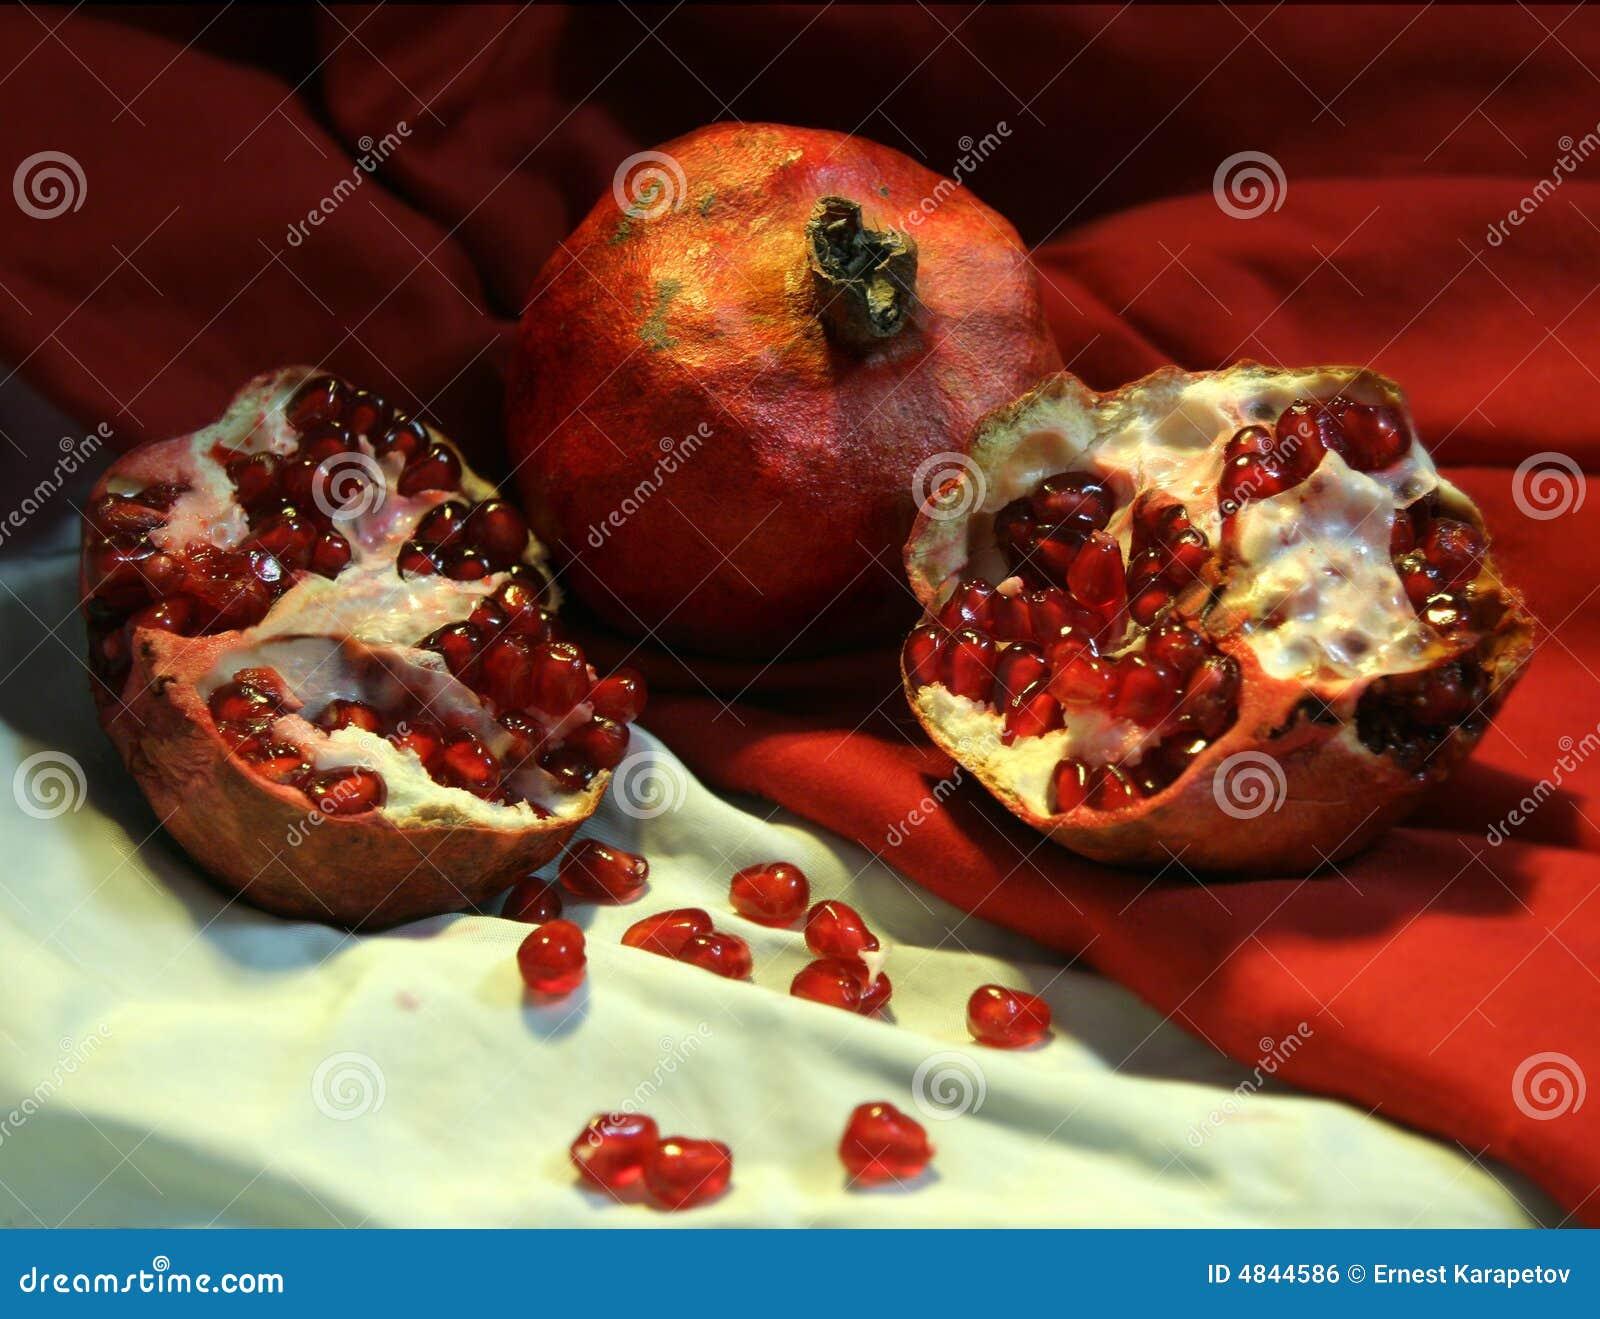 Drie Rode Granaatappels